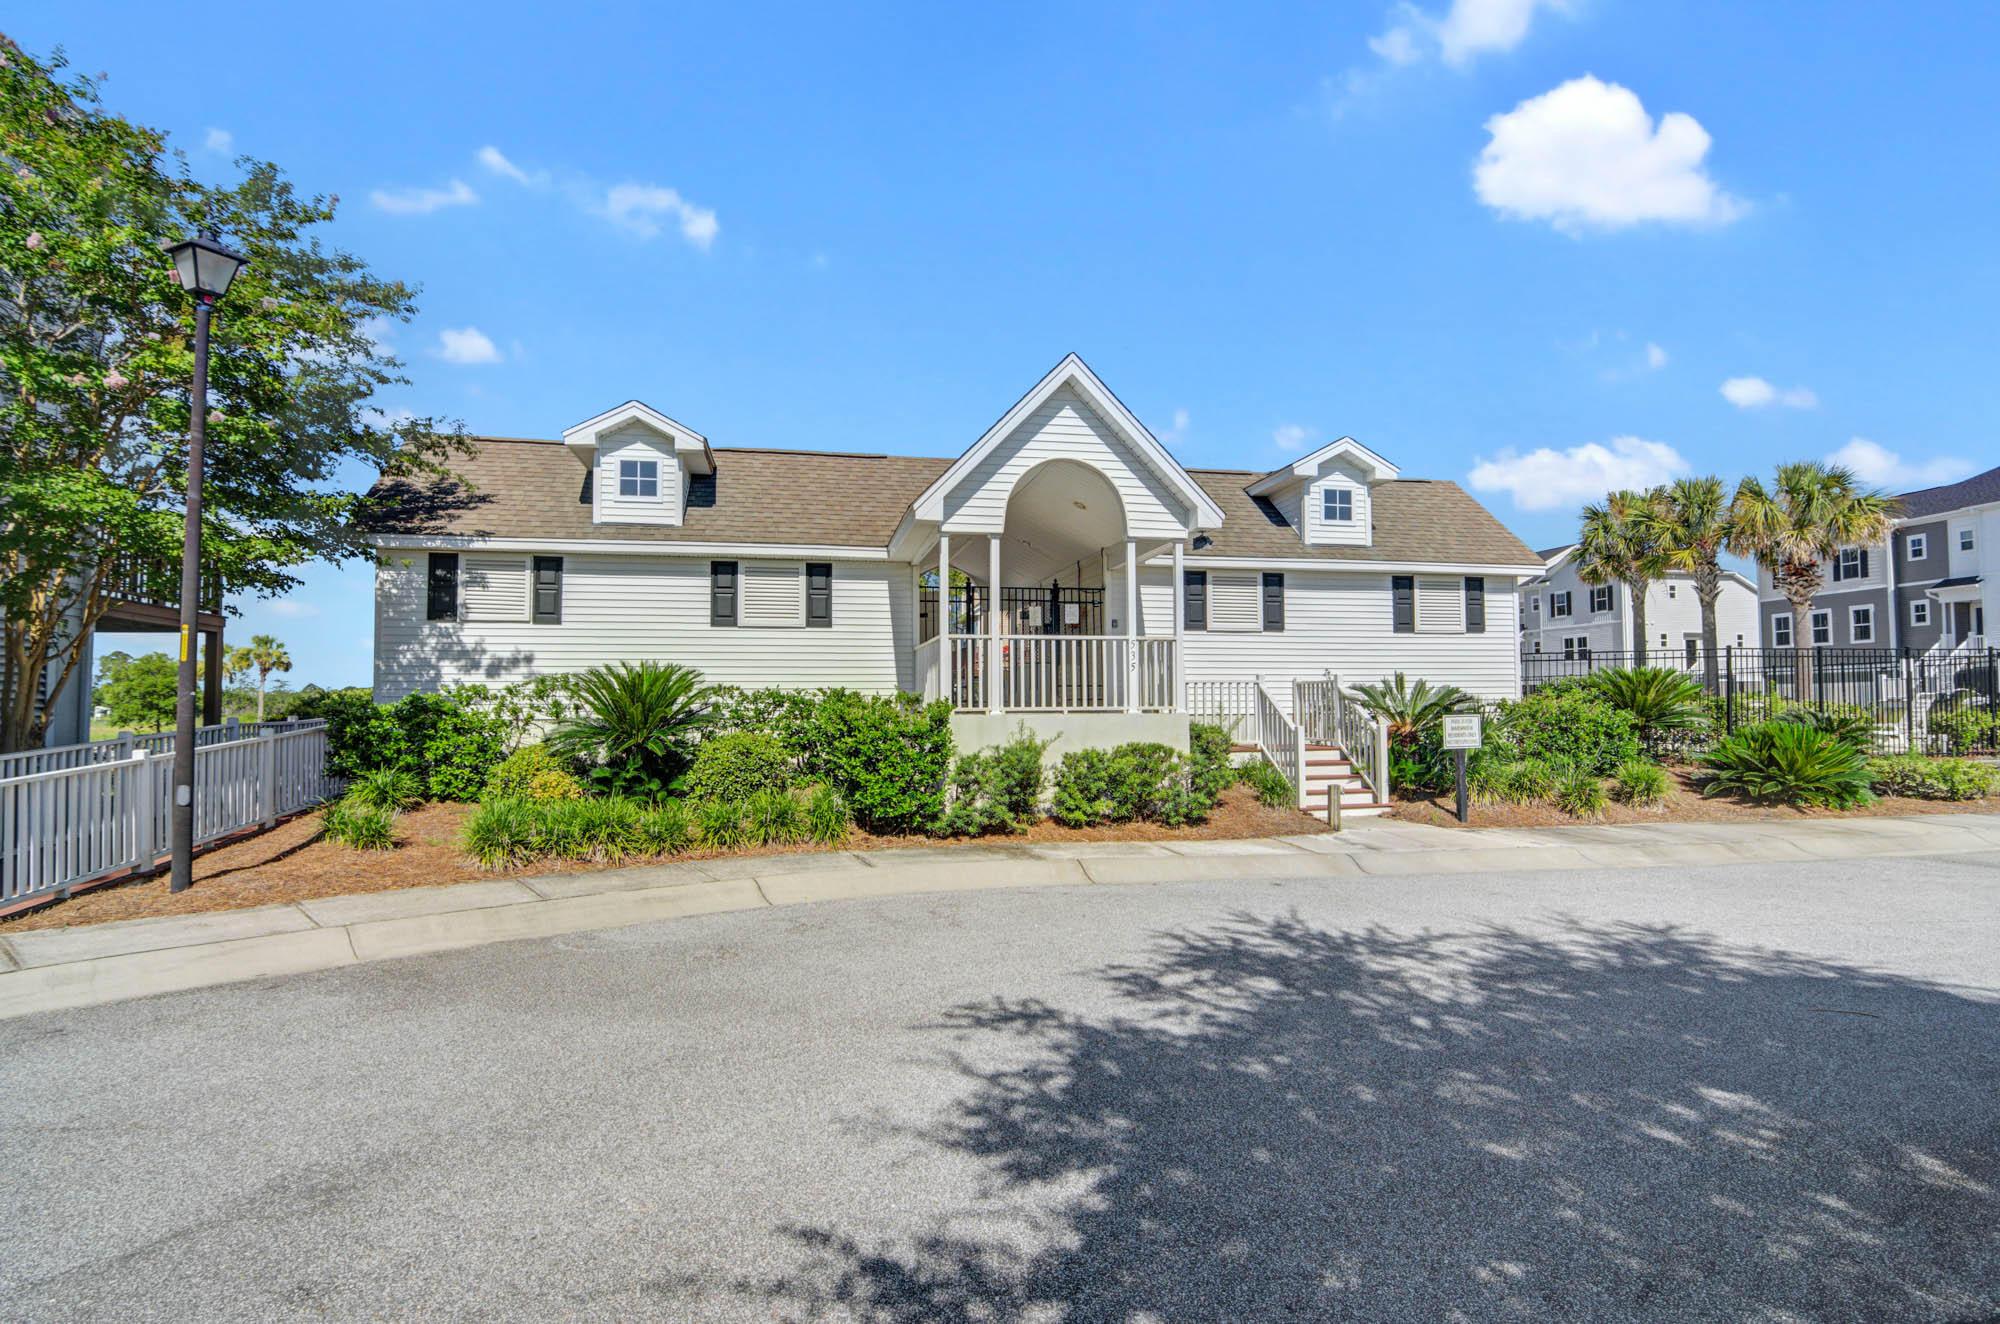 Marshview Commons Homes For Sale - 530 Mclernon, Johns Island, SC - 15